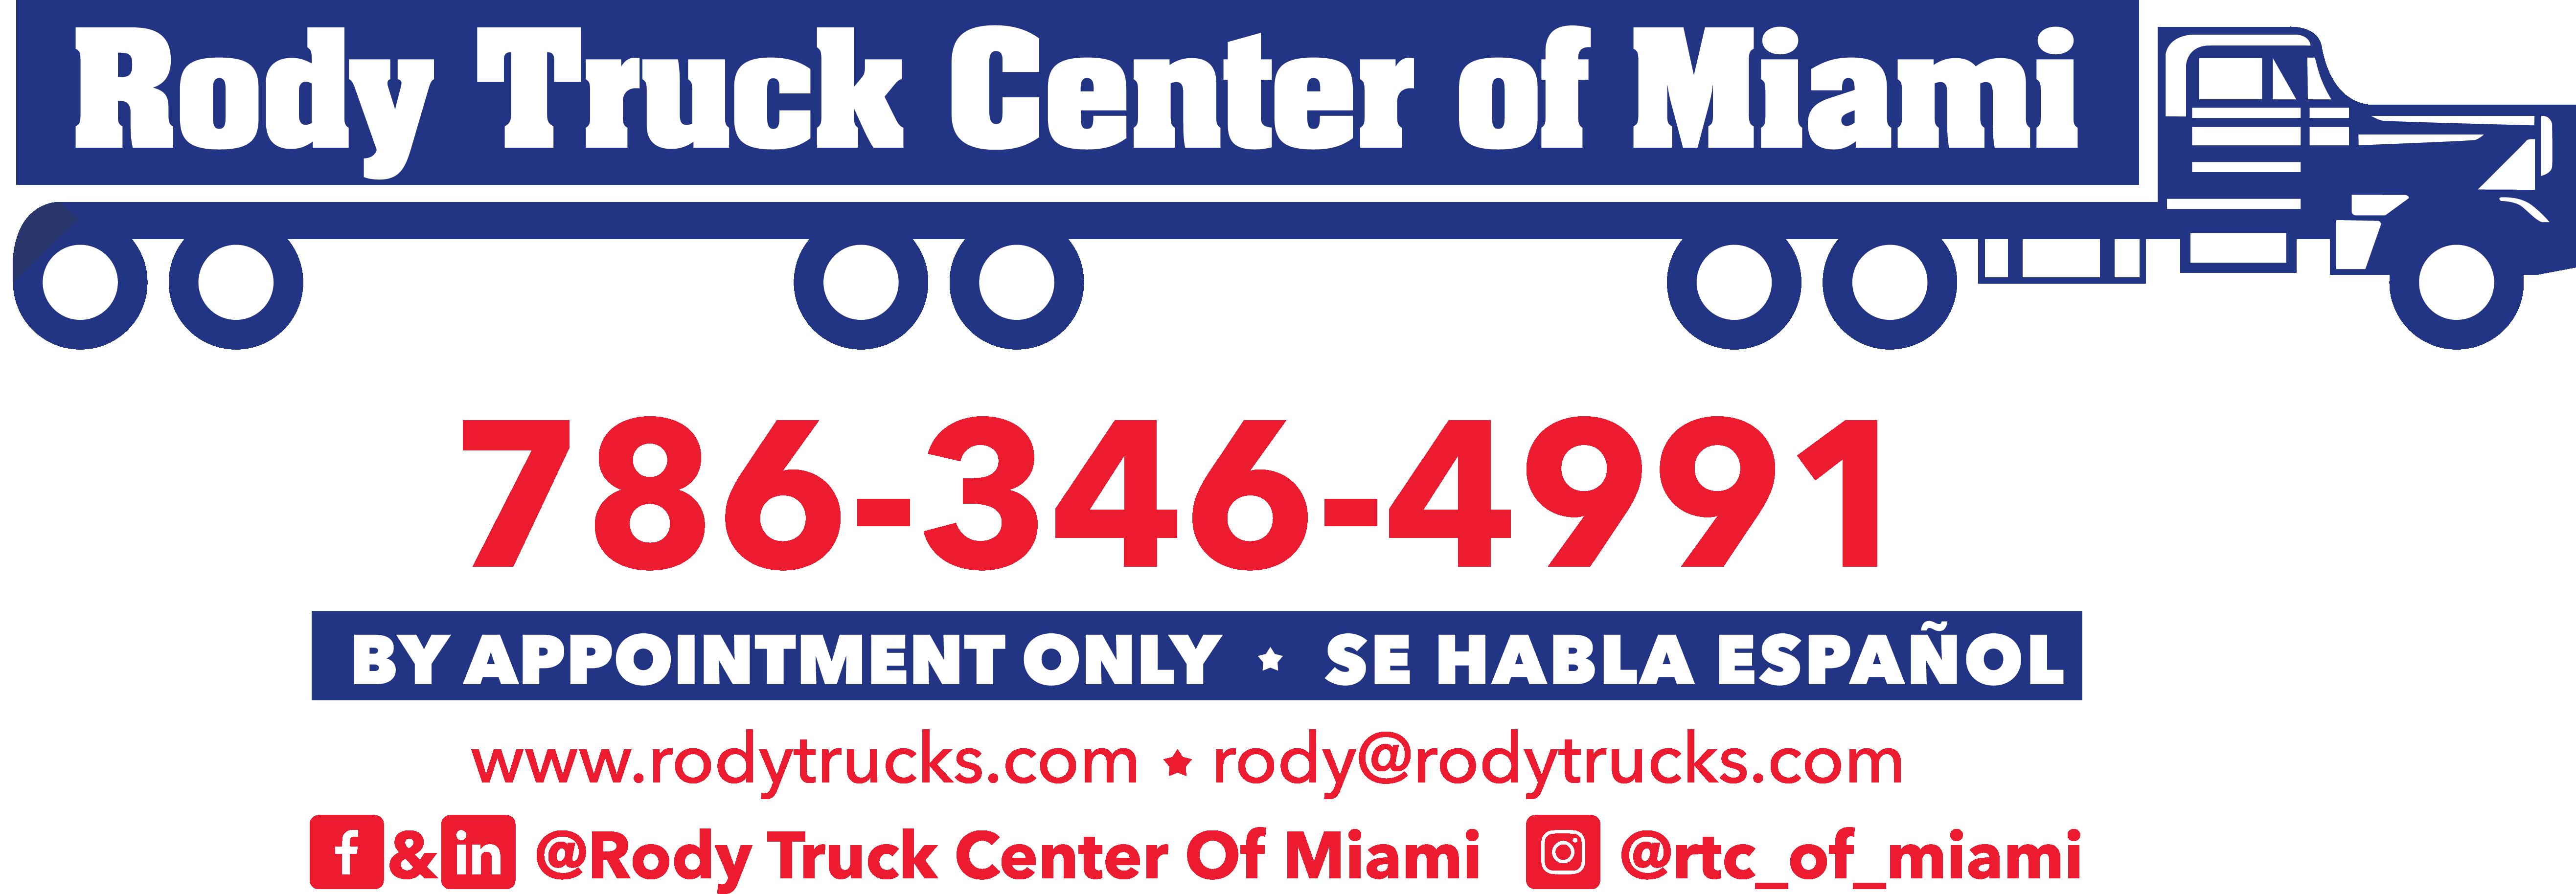 Rody Truck Center